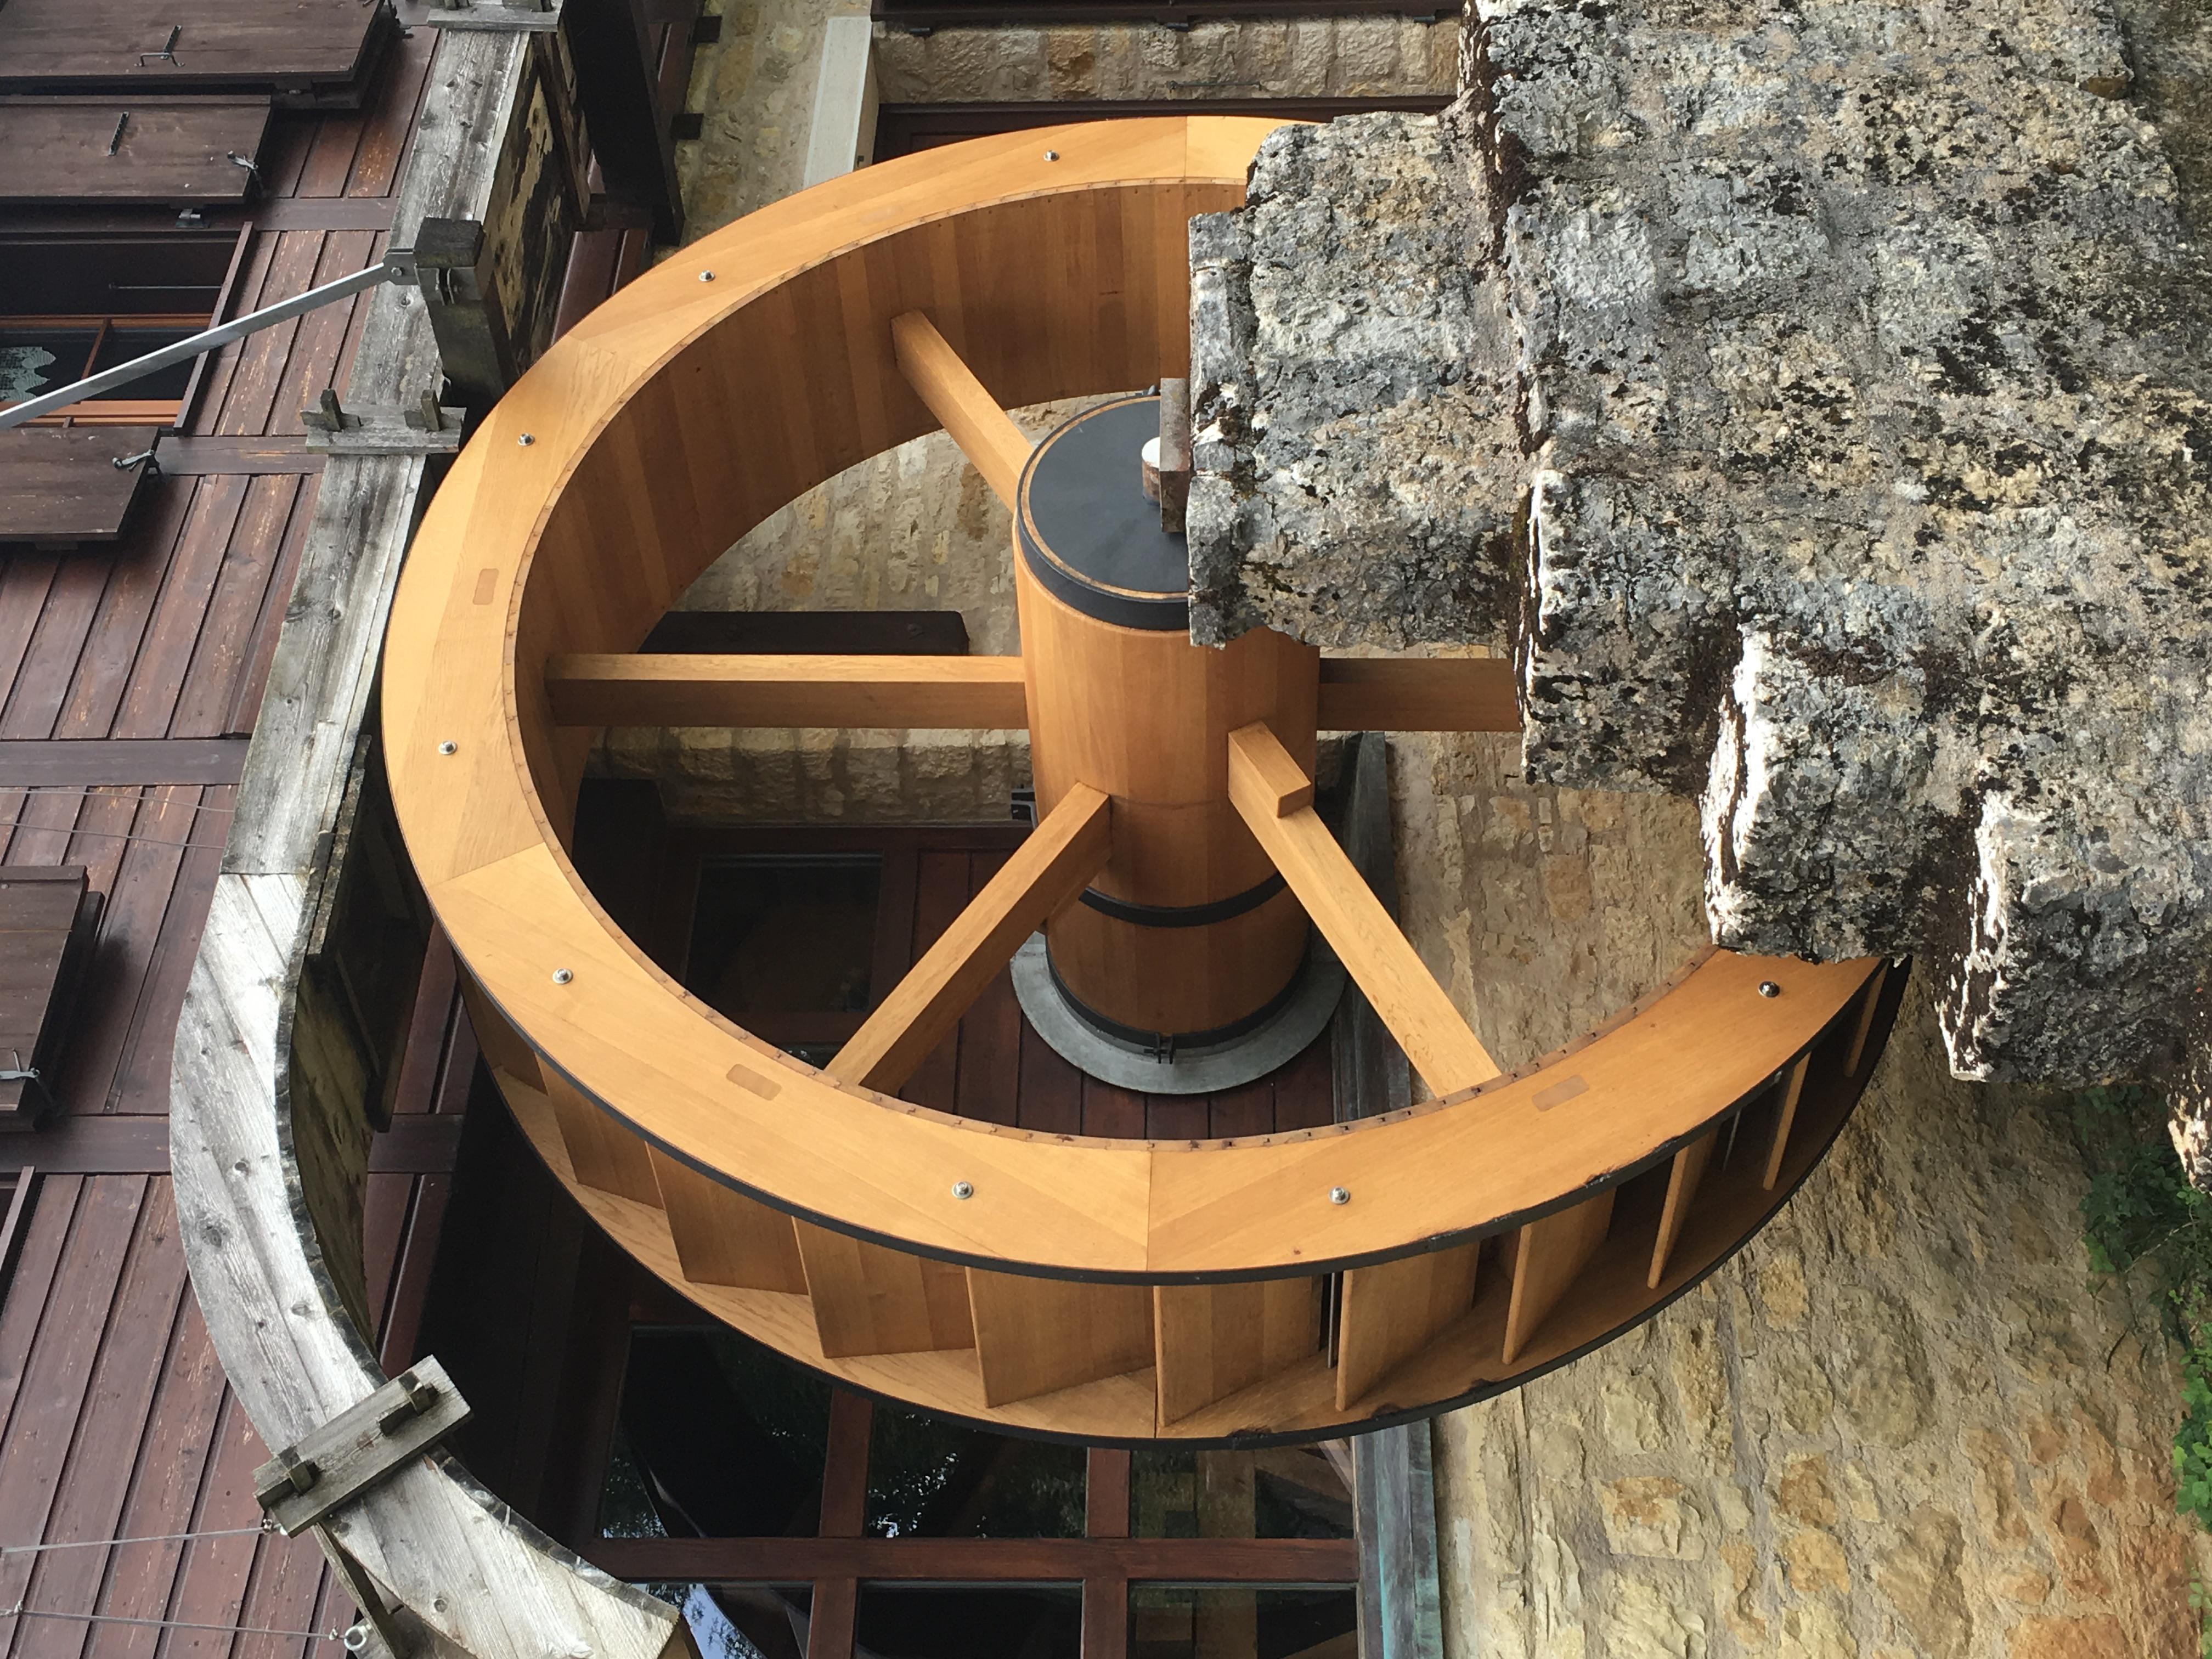 Roue de moulin